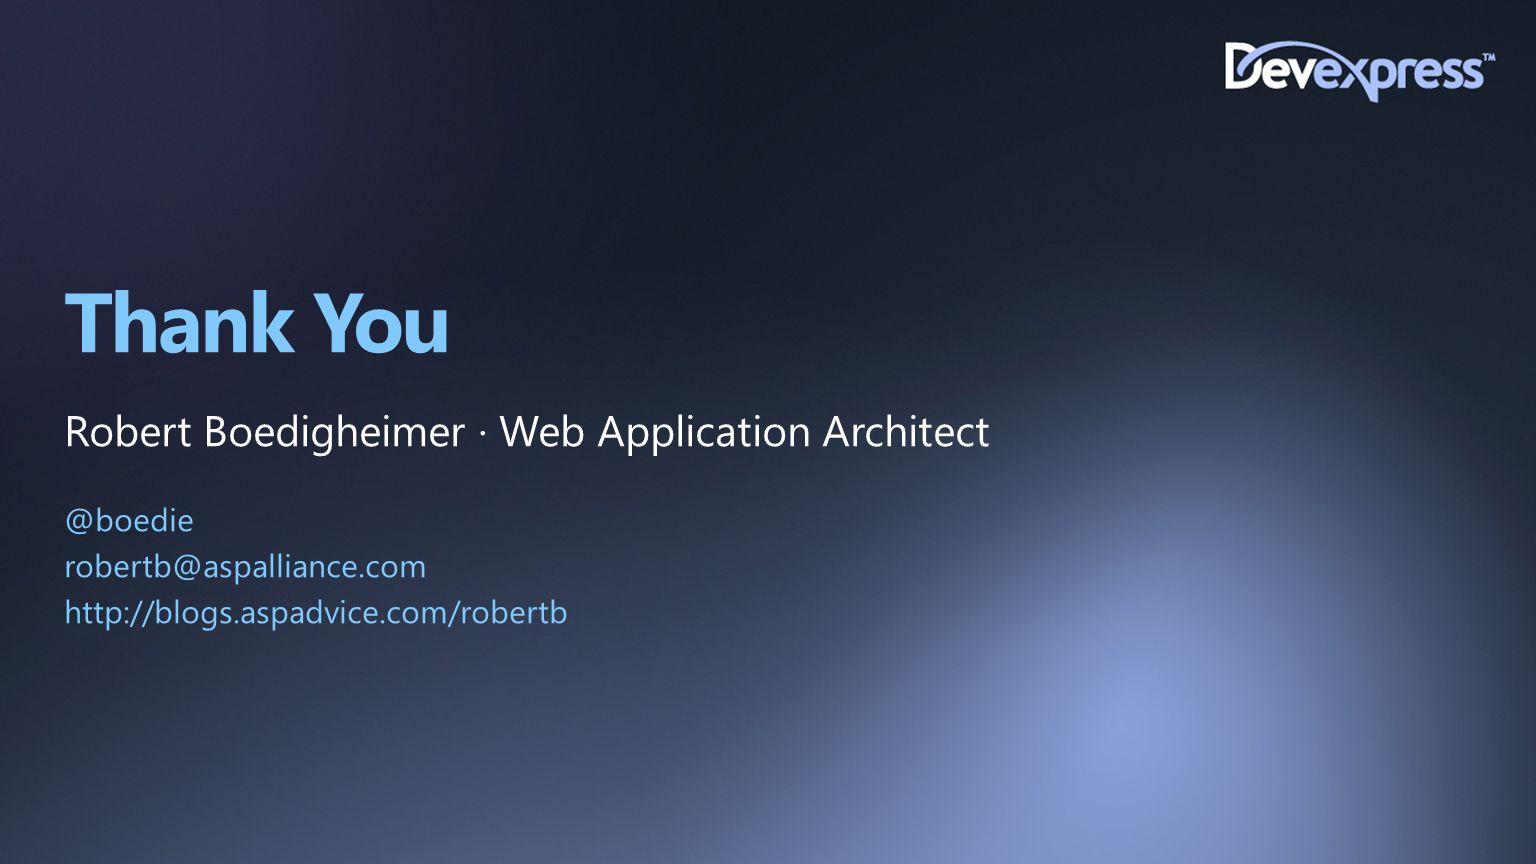 Thank You Robert Boedigheimer ∙ Web Application Architect @boedie robertb@aspalliance.com http://blogs.aspadvice.com/robertb